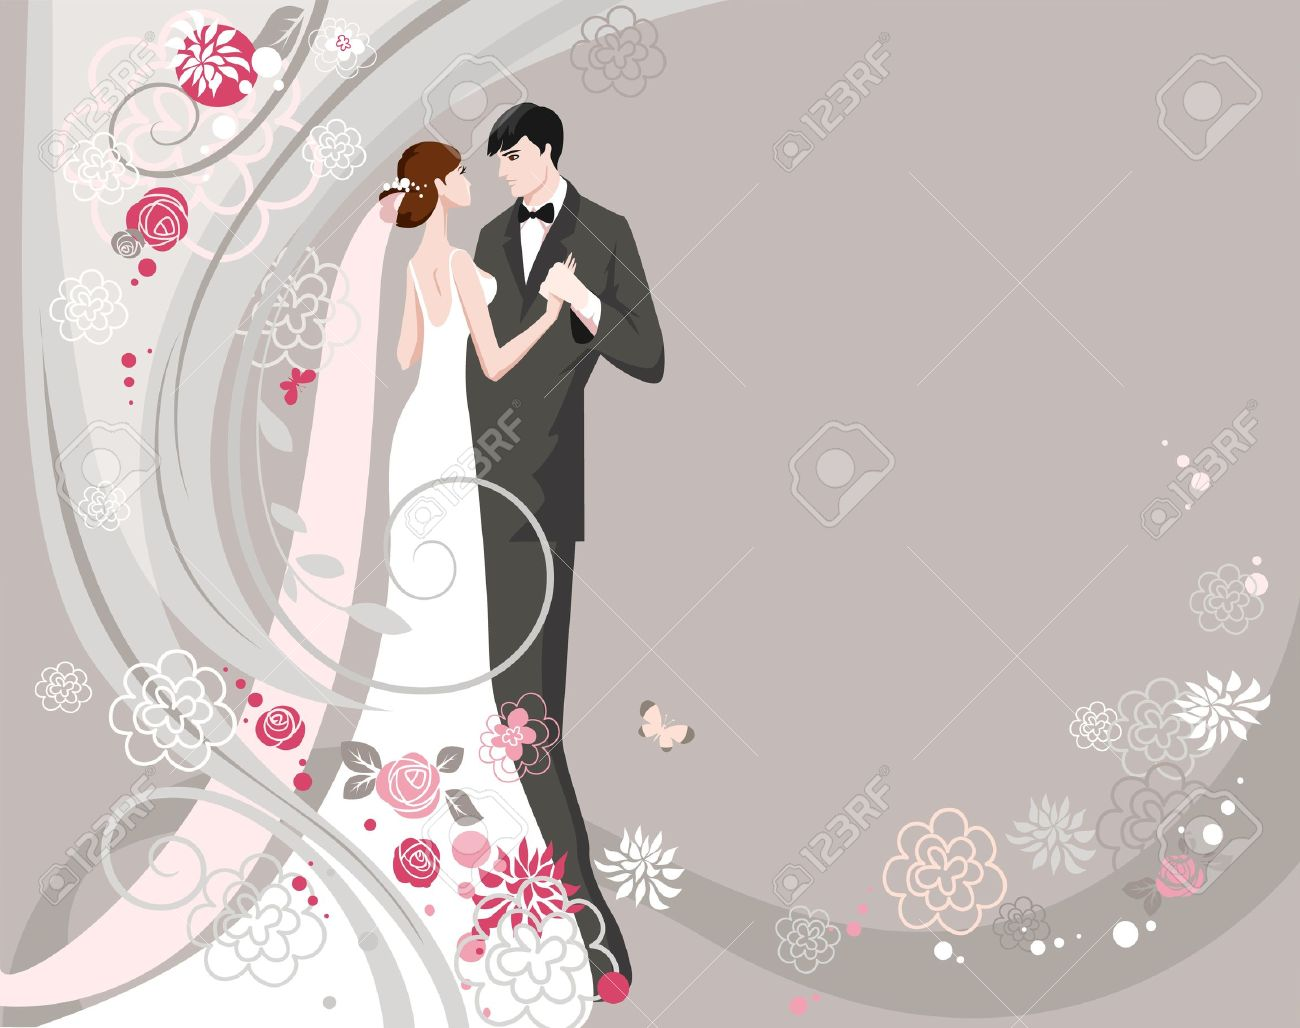 Abstract wedding ceremony Stock Vector - 9932466